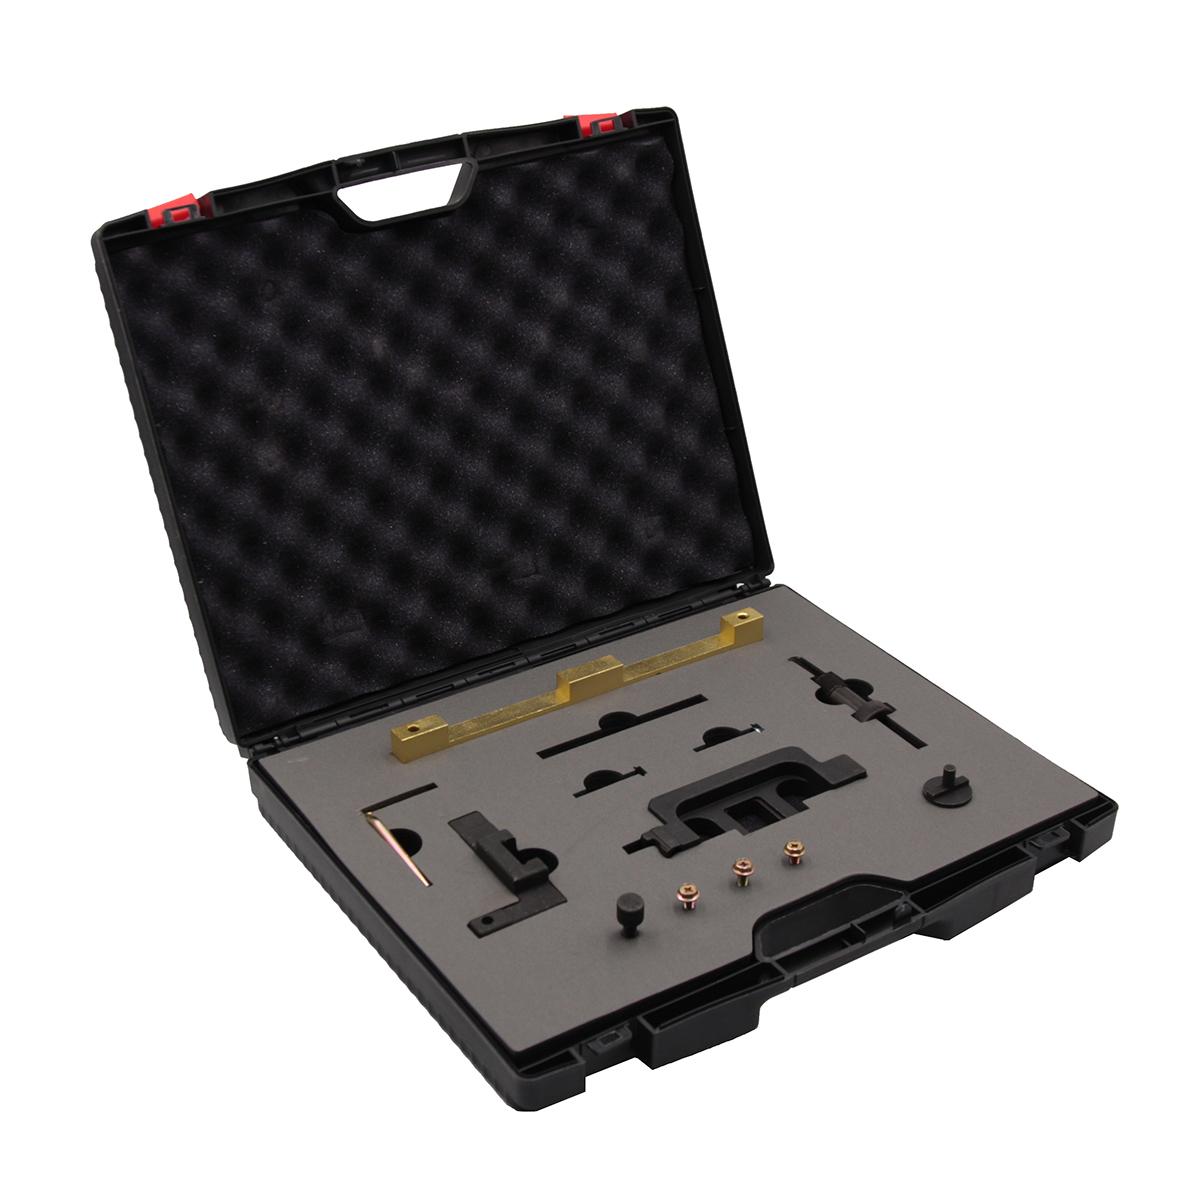 Инструмент для ГРМ BMW N42 / N46 Car-Tool CT-2068R1